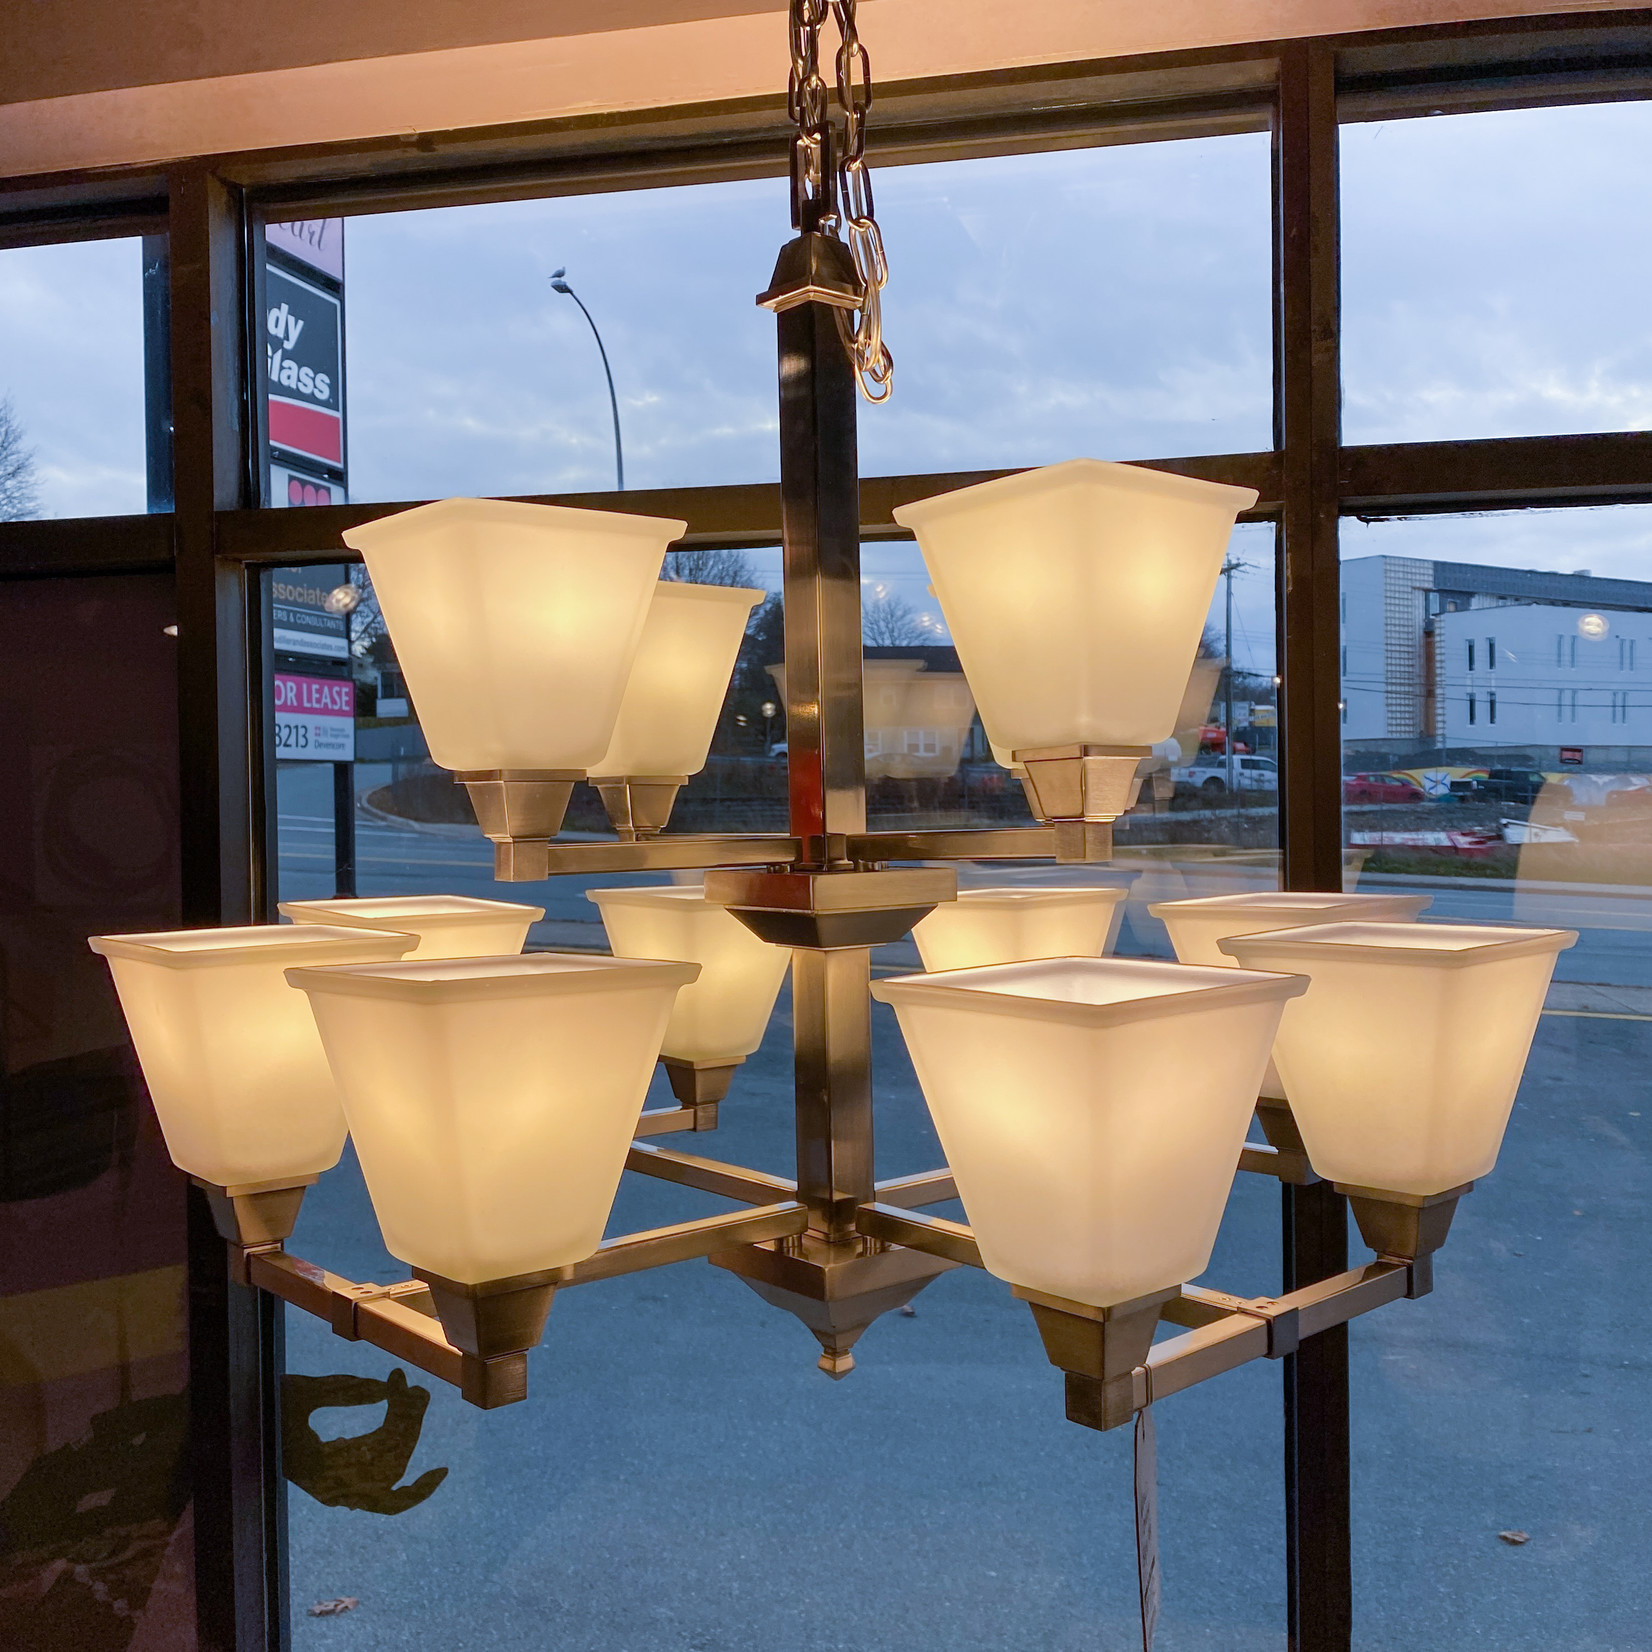 Seagull Lighting Denhelm 12-Light Multi-Tiered Chandelier - FINAL SALE